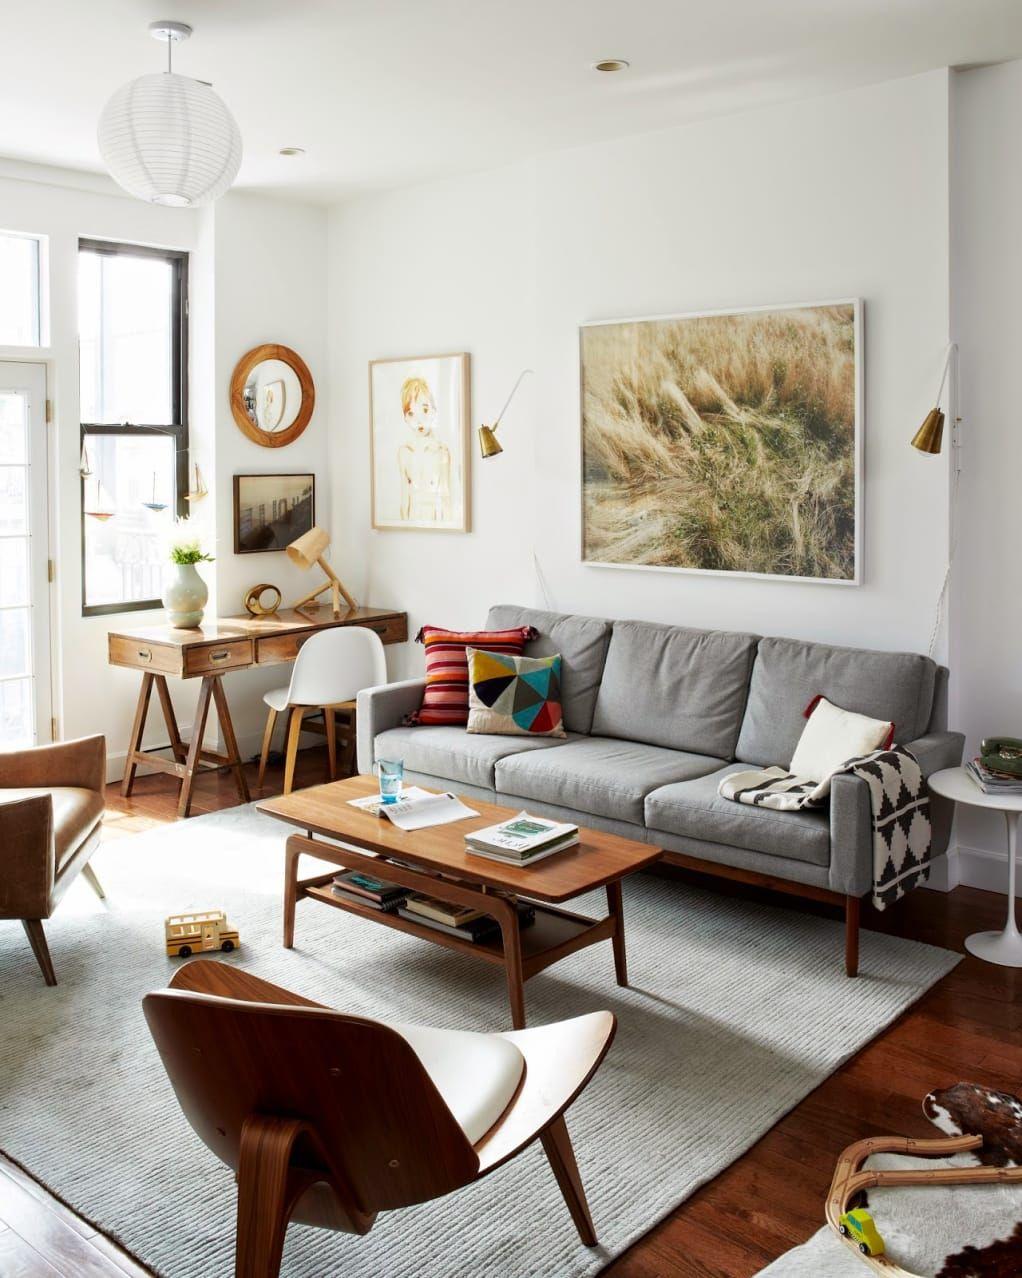 20 Examples Of Minimal Interior Design 17 Small Living Room Decor Small Modern Living Room Small Living Room Furniture